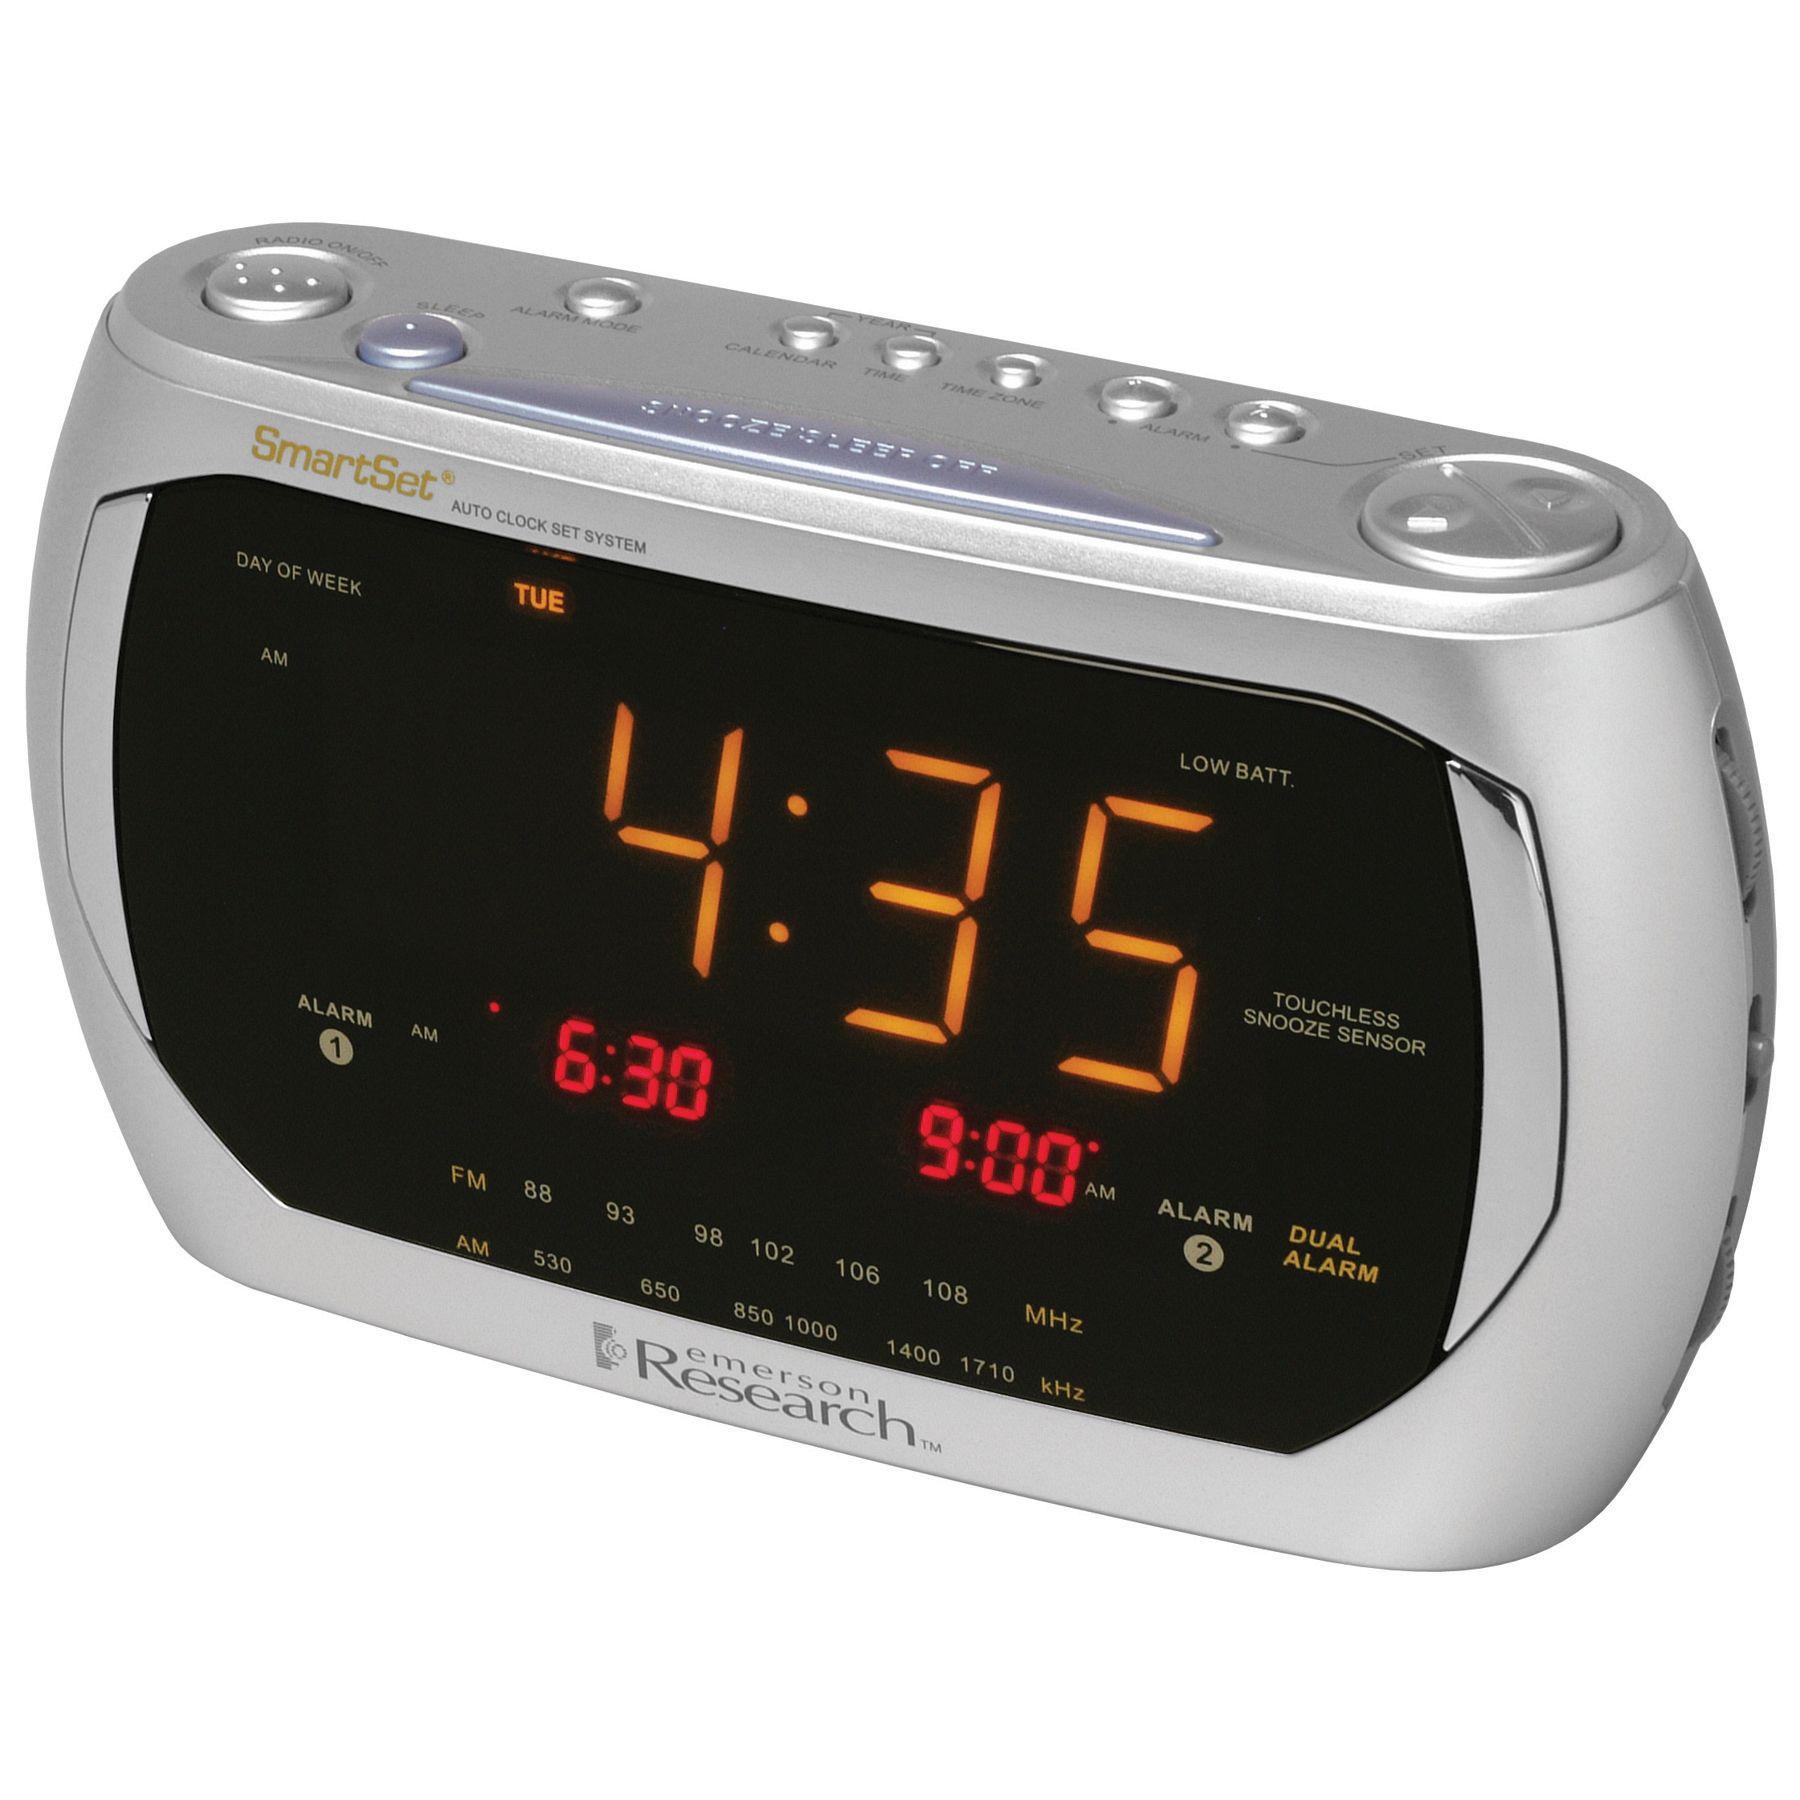 Emerson Cks3020 Fm Clock Radio With Dual Alarm